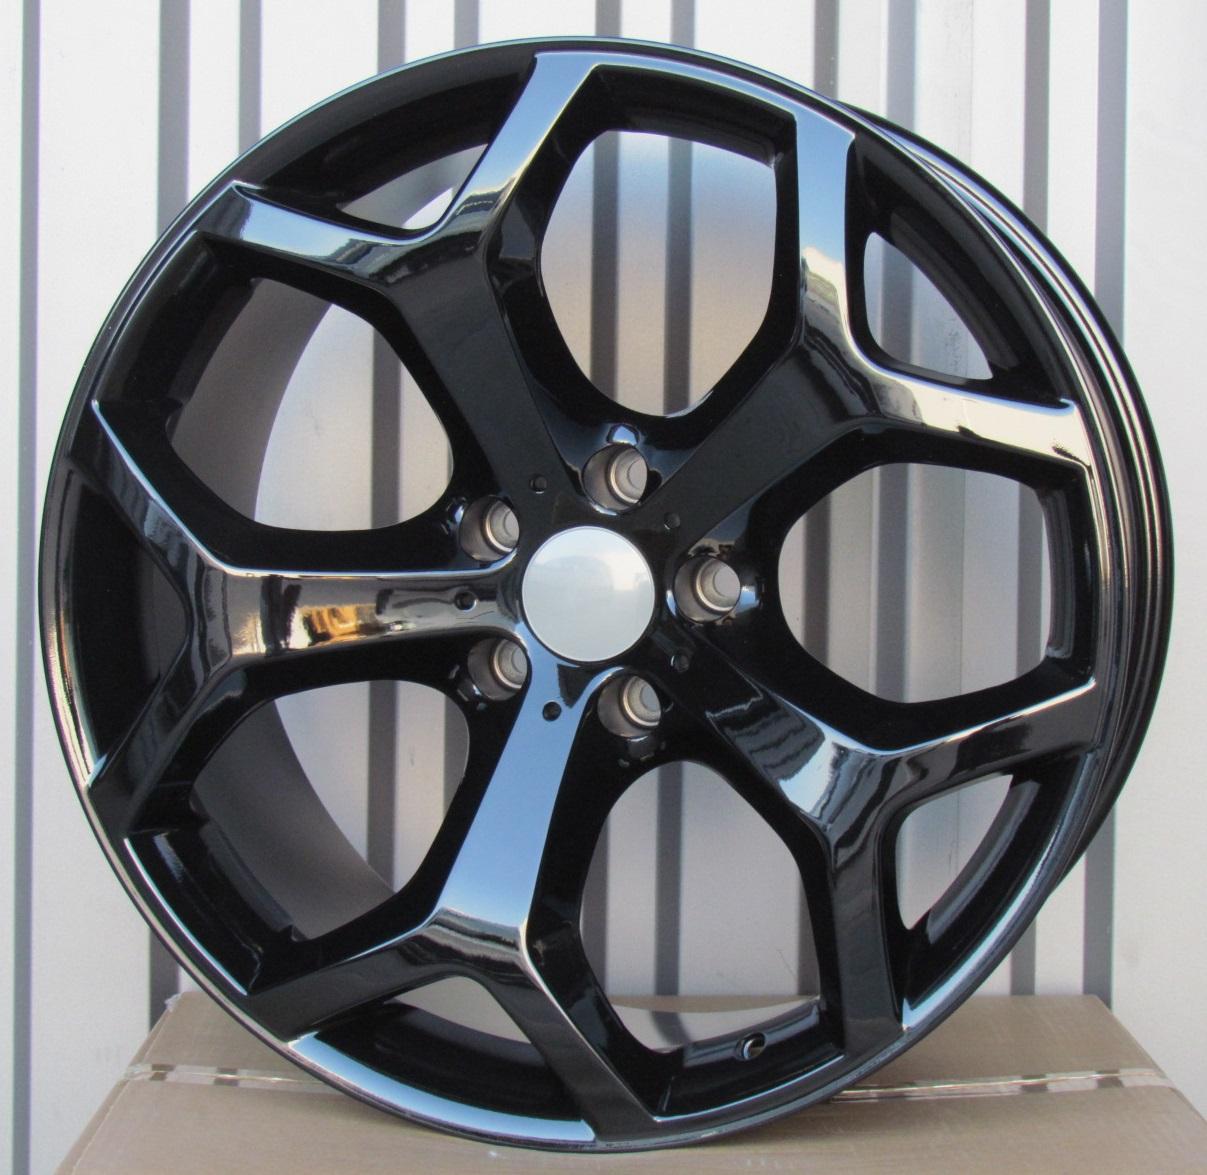 B19X9 5x120 ET48 74.1 XF711 (B70, FR595) BLACK RWR BM X5 (K4+P) 9x19 ET48 5x120